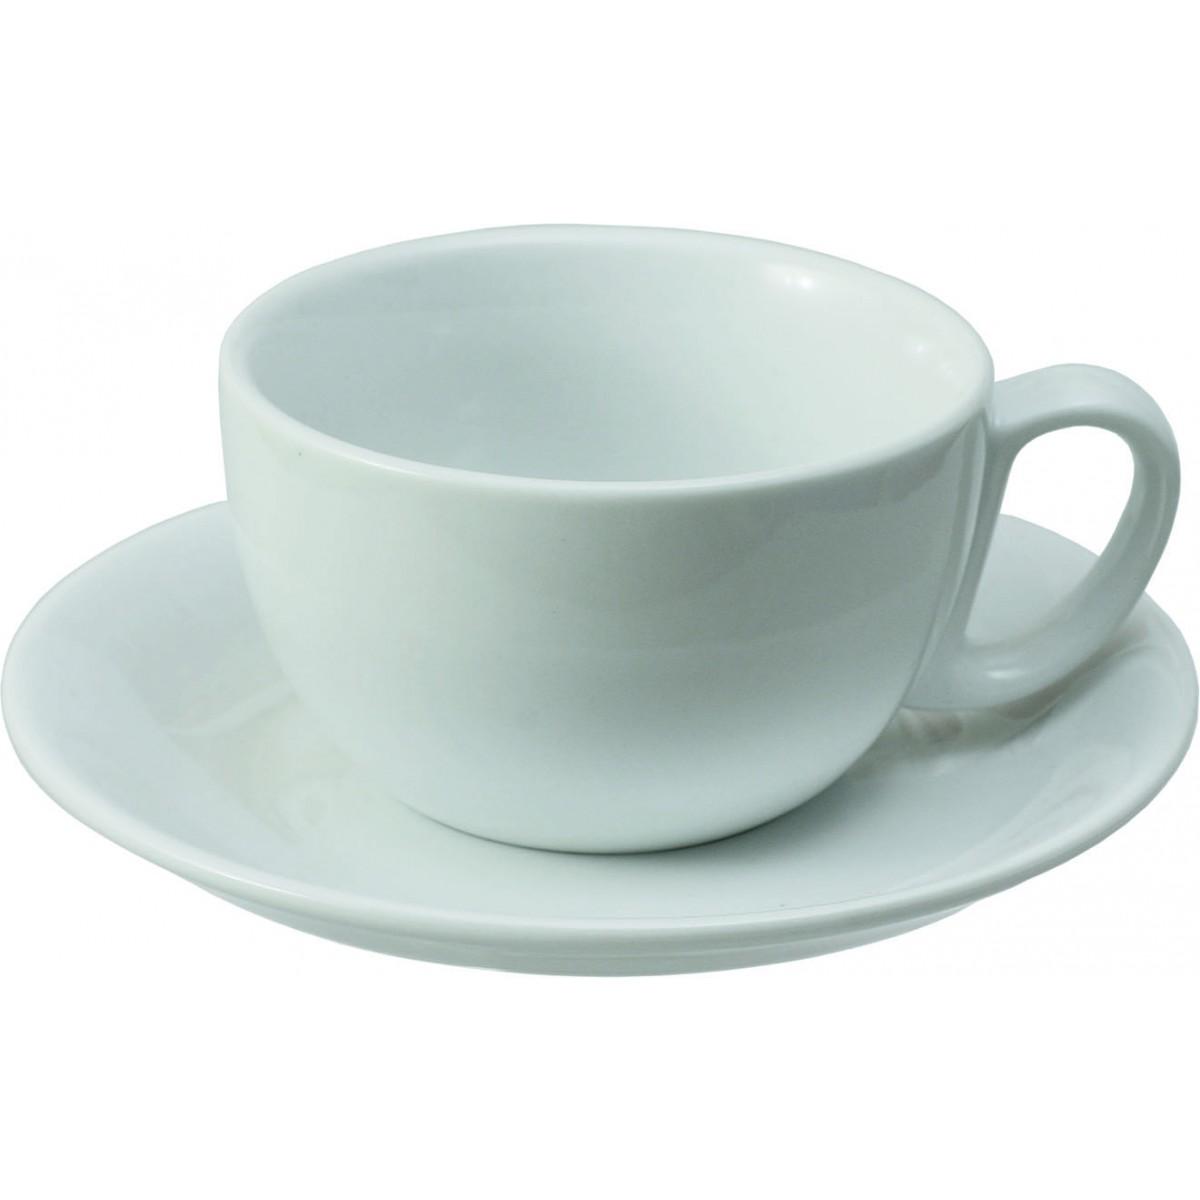 Kaffekop-33